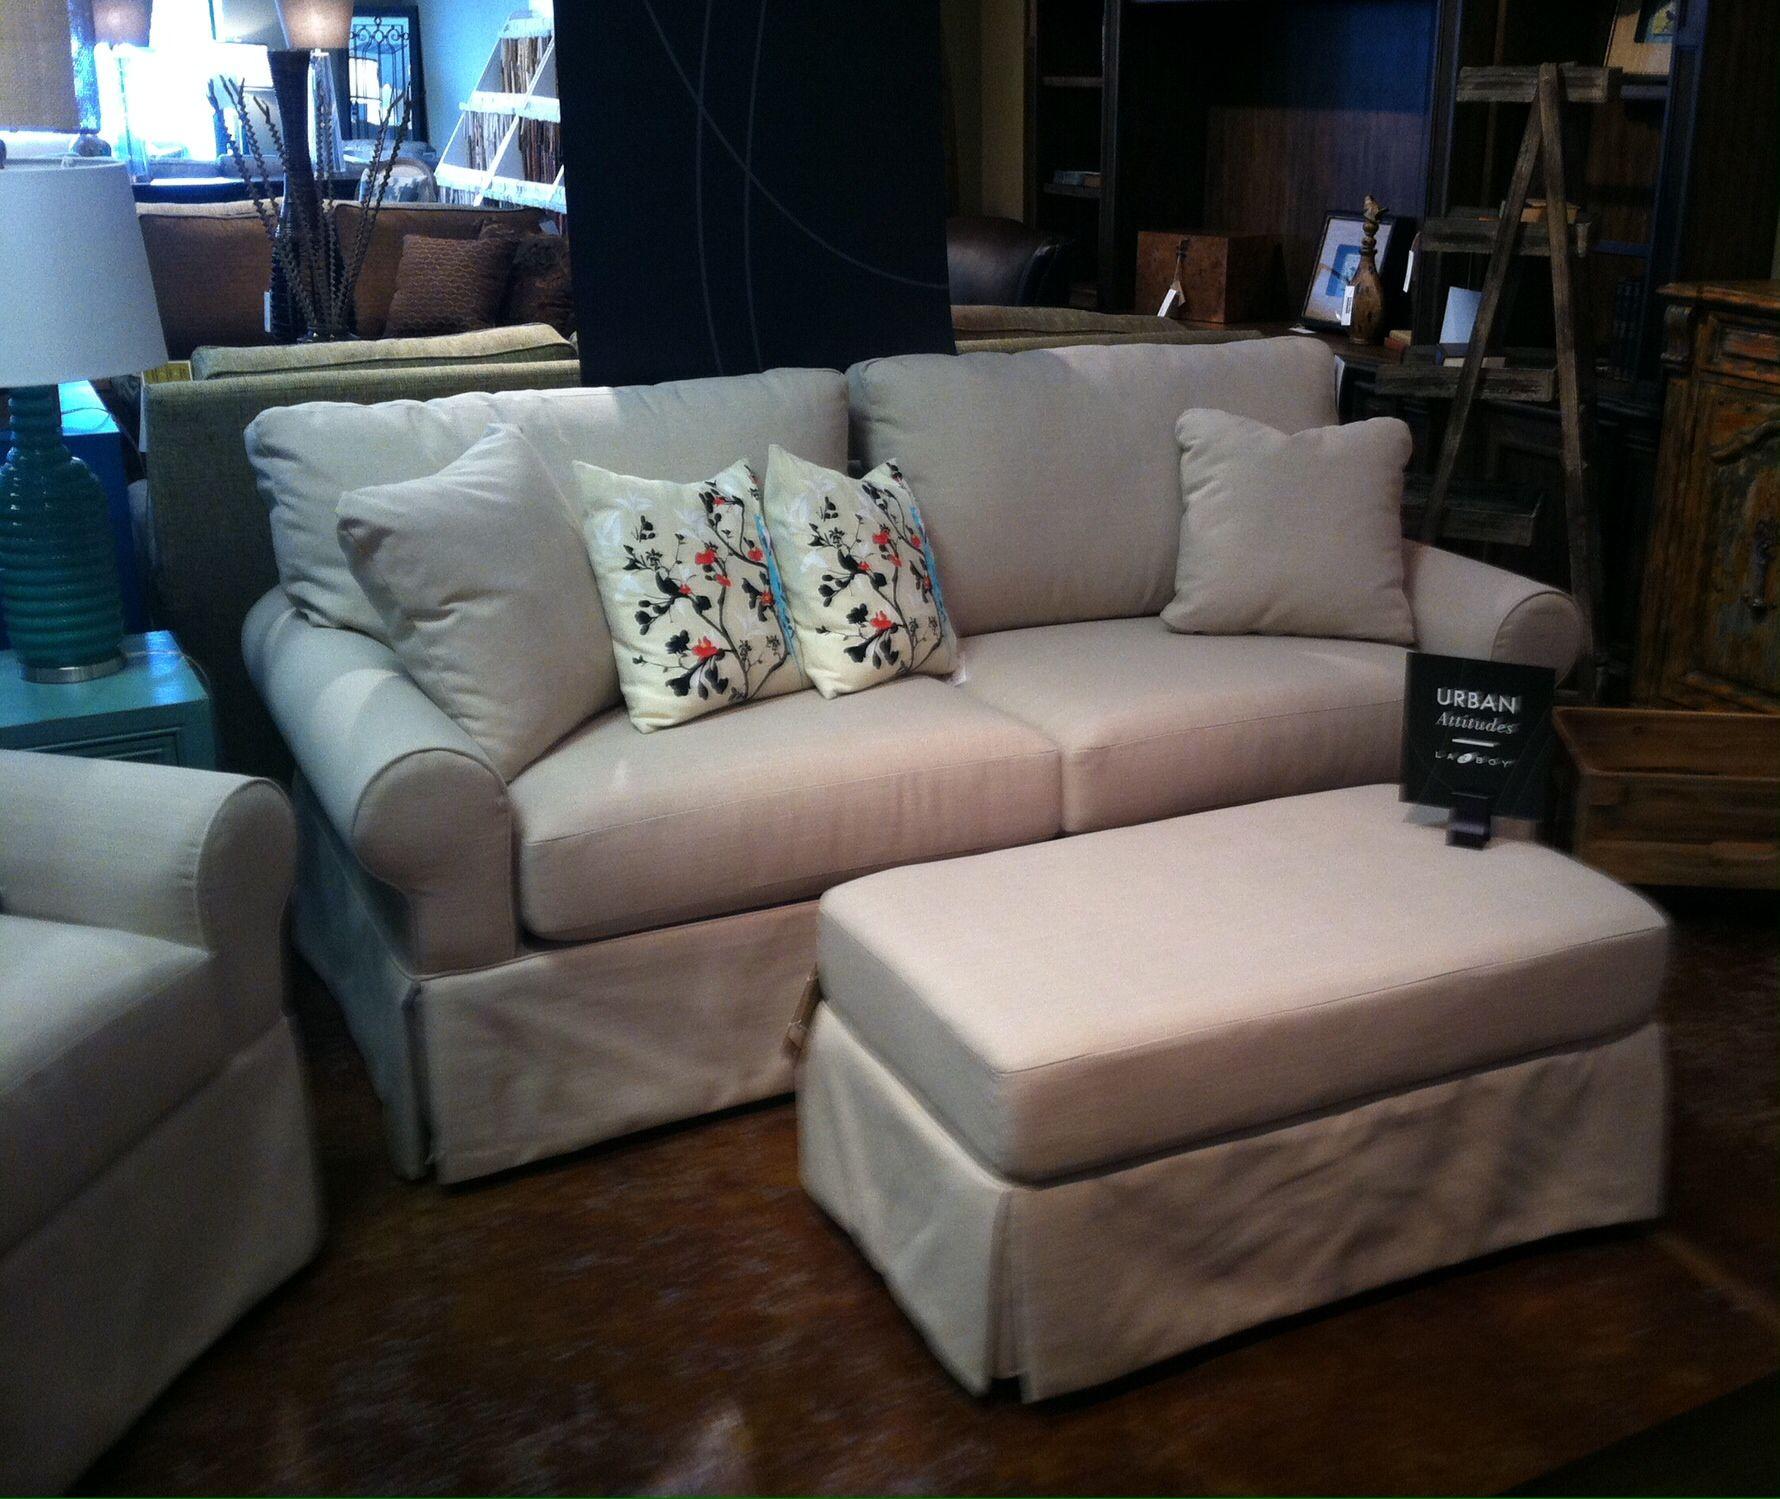 Lazboy urban attitudes sofa chair and ottoman